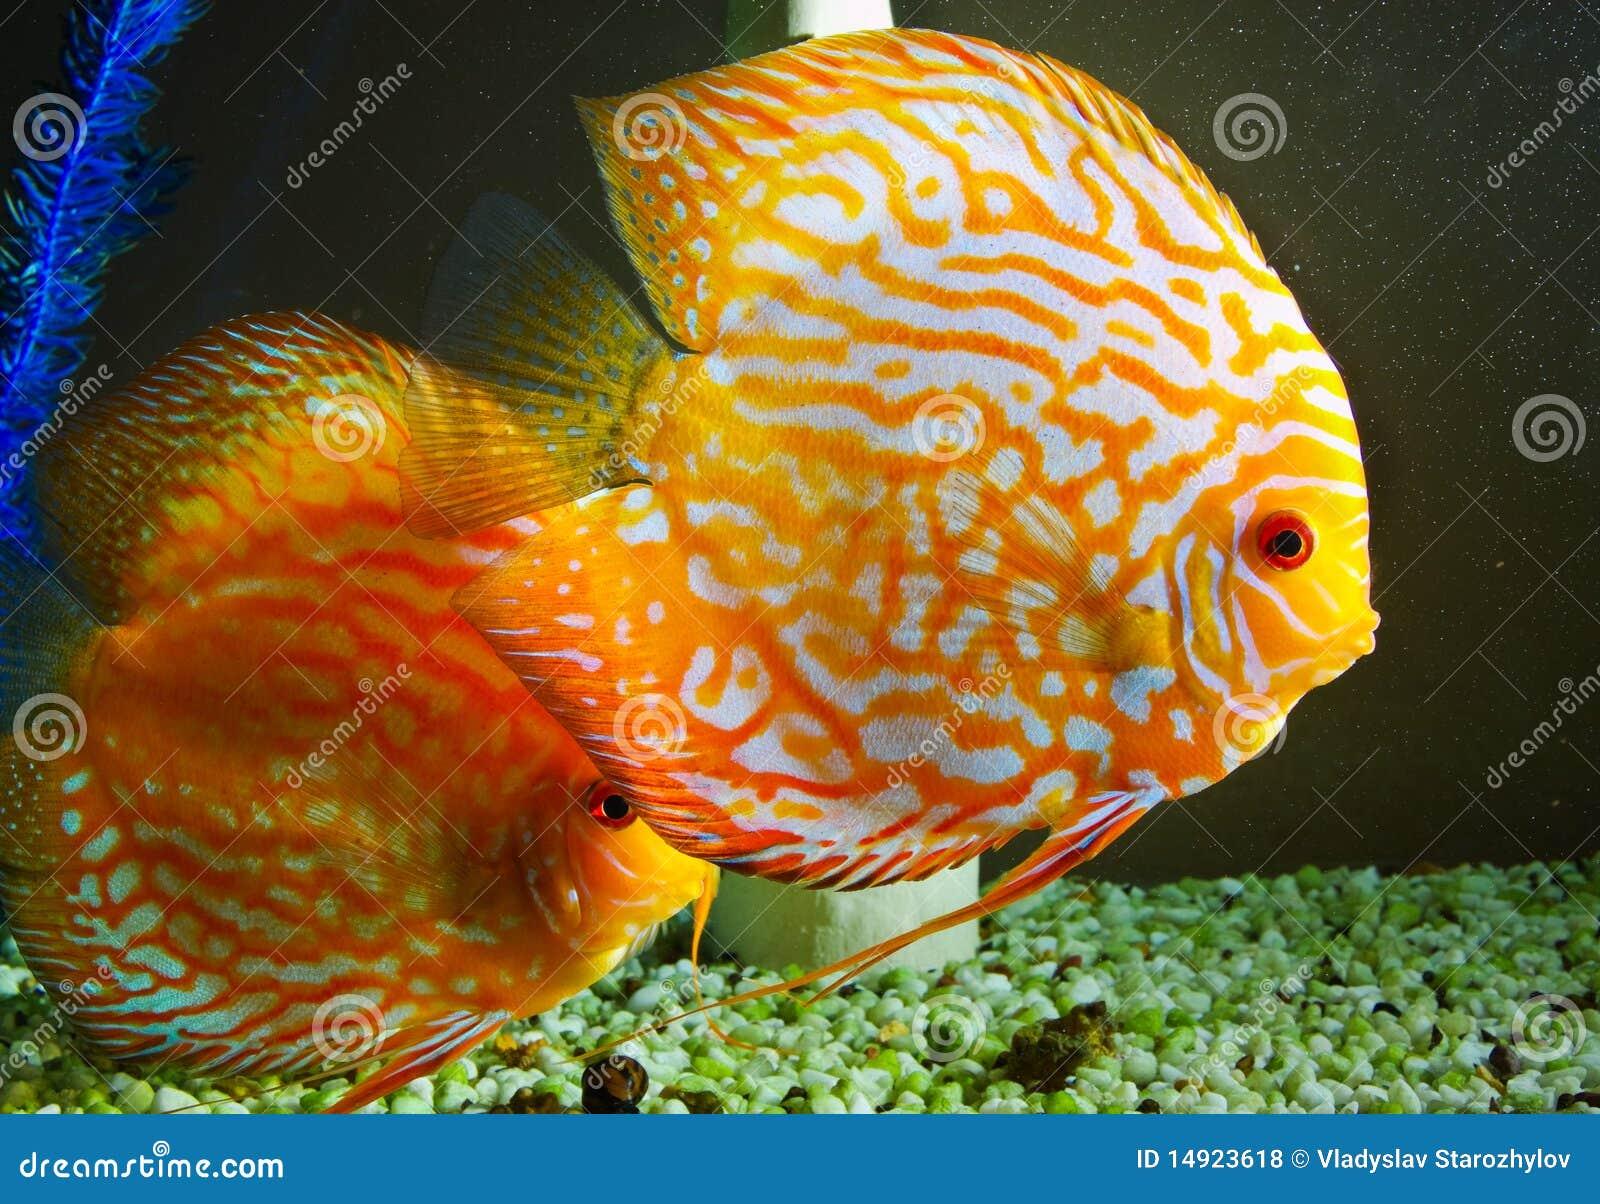 Freshwater aquarium fish colorful saltwater and fresh for Yellow fish tank water